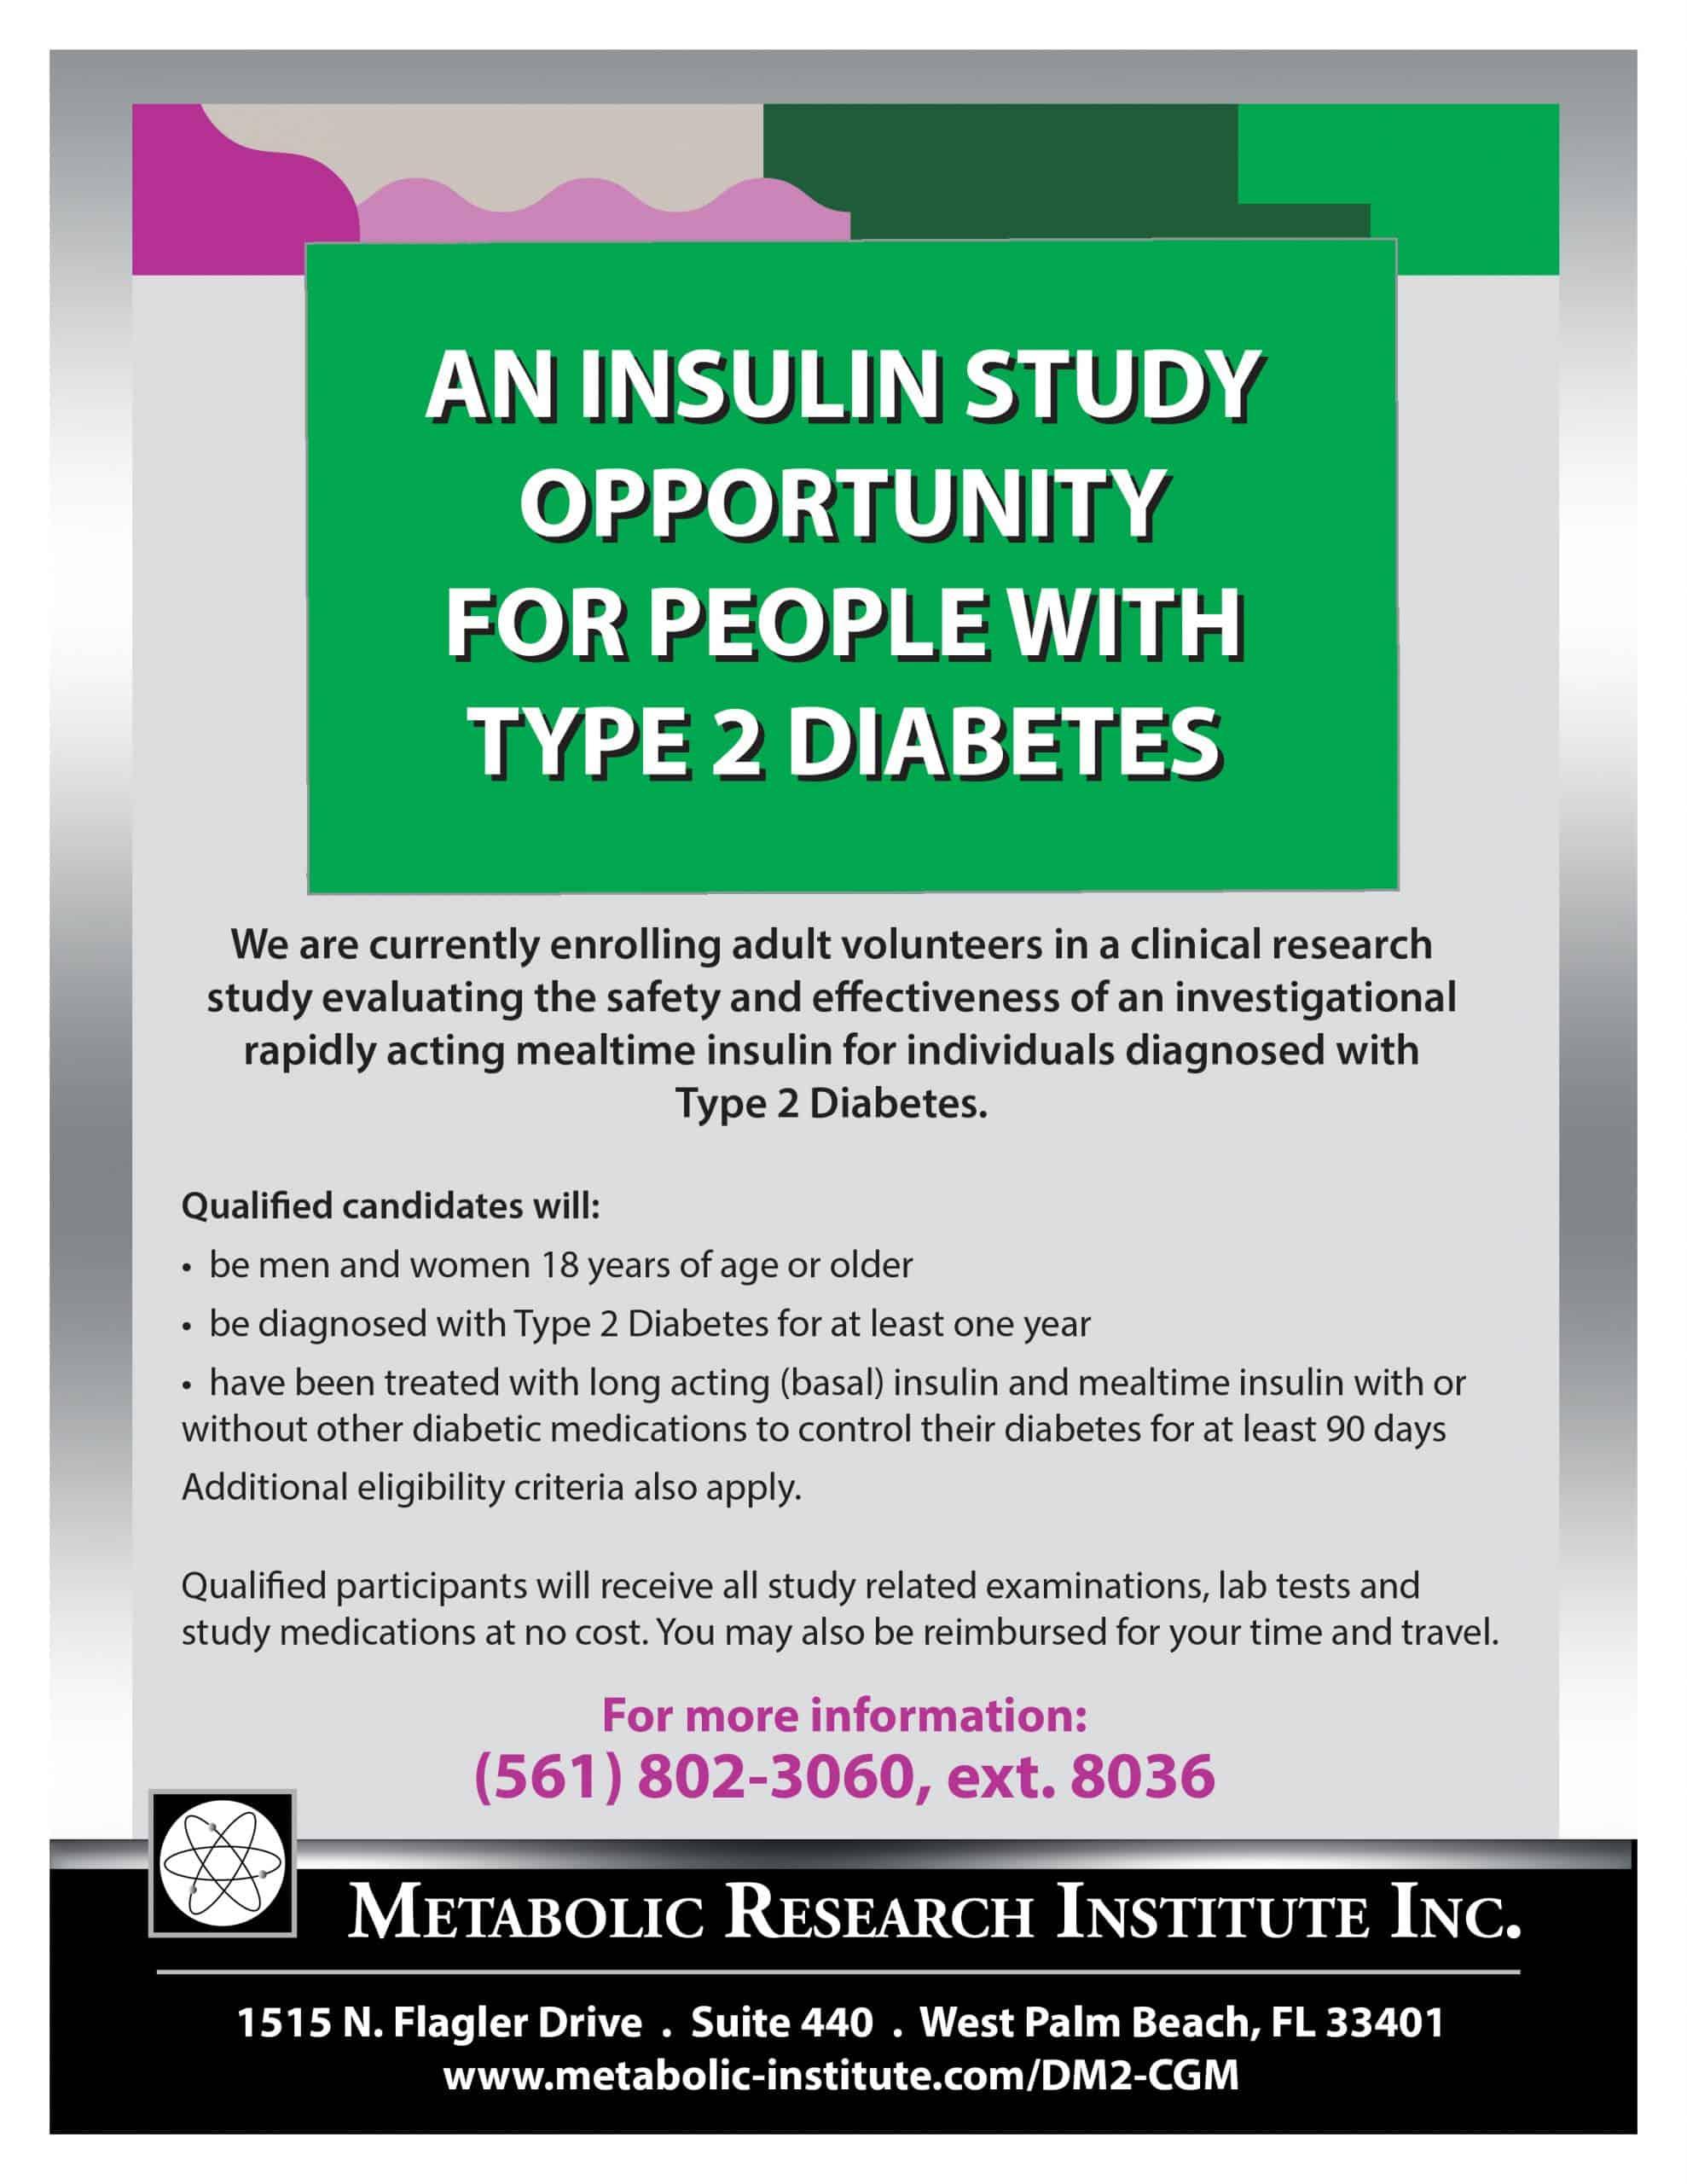 Type 2 Diabetes Clinical Study Flyer